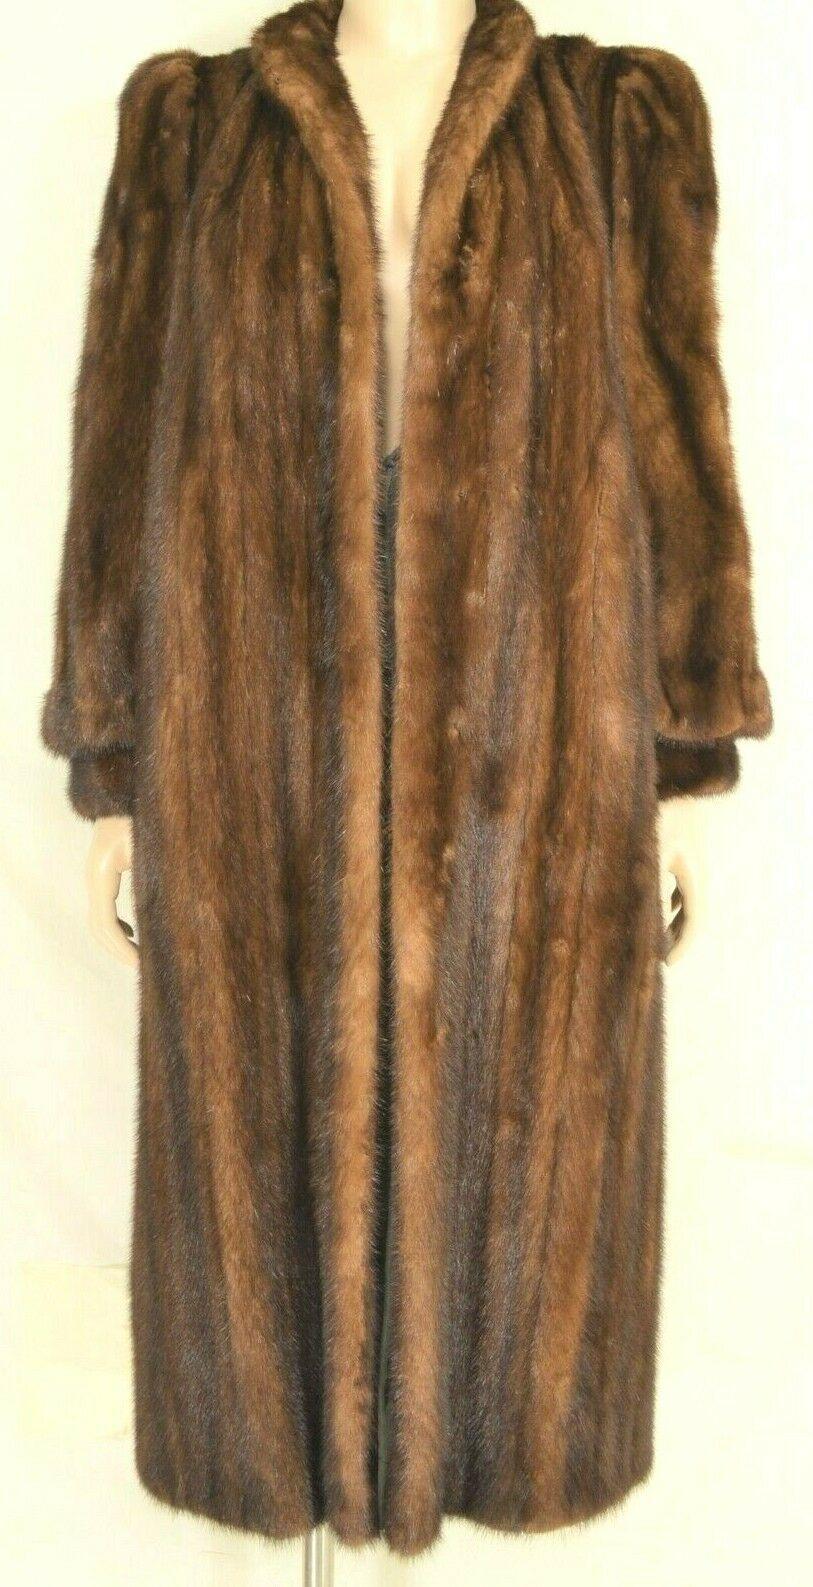 France Olivia mink fur coat FR 44 full length mahogany chic sophisticate brown